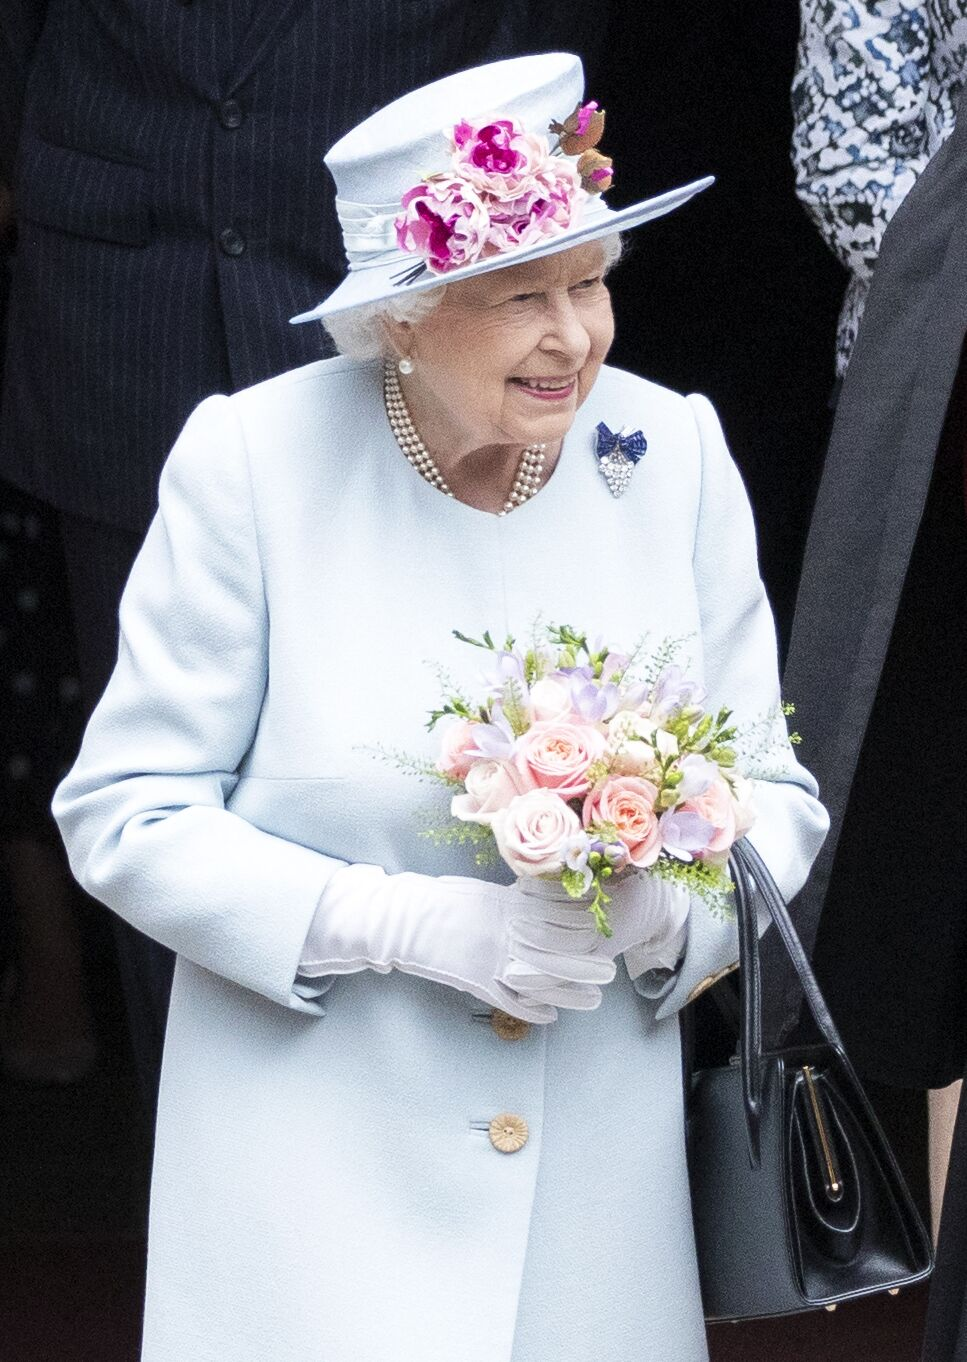 La reine à Edimbourg en 2019